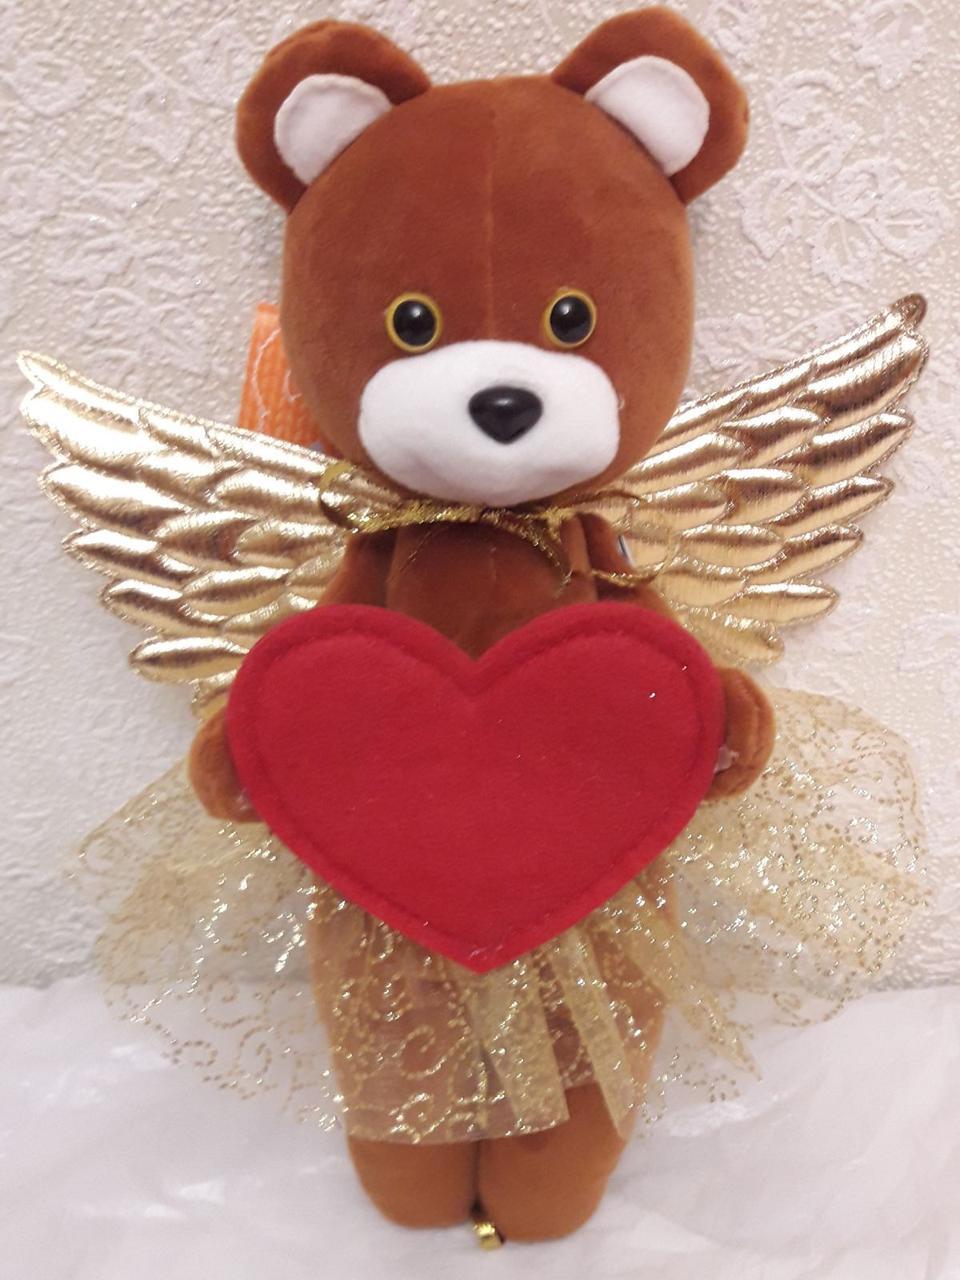 М'яка іграшка 30см – Янголятко-ведмежа з серцем